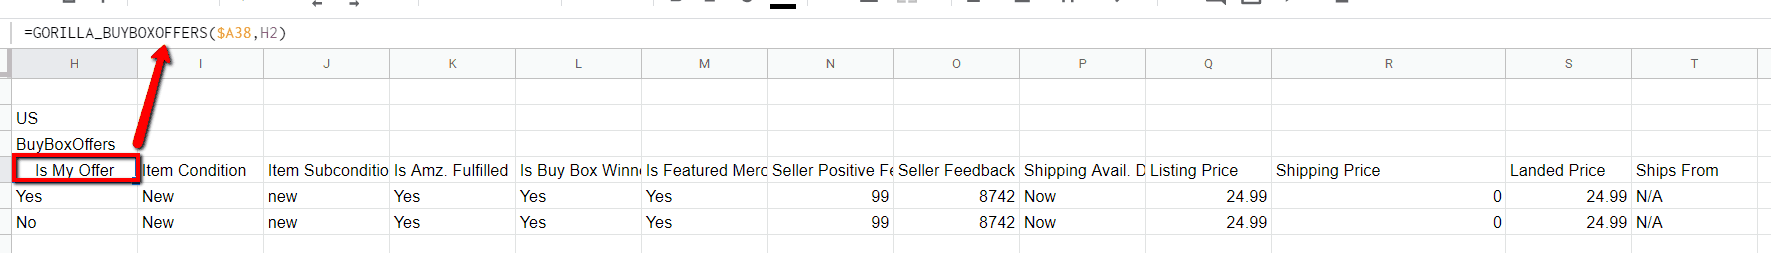 buyboxoffer data points fba